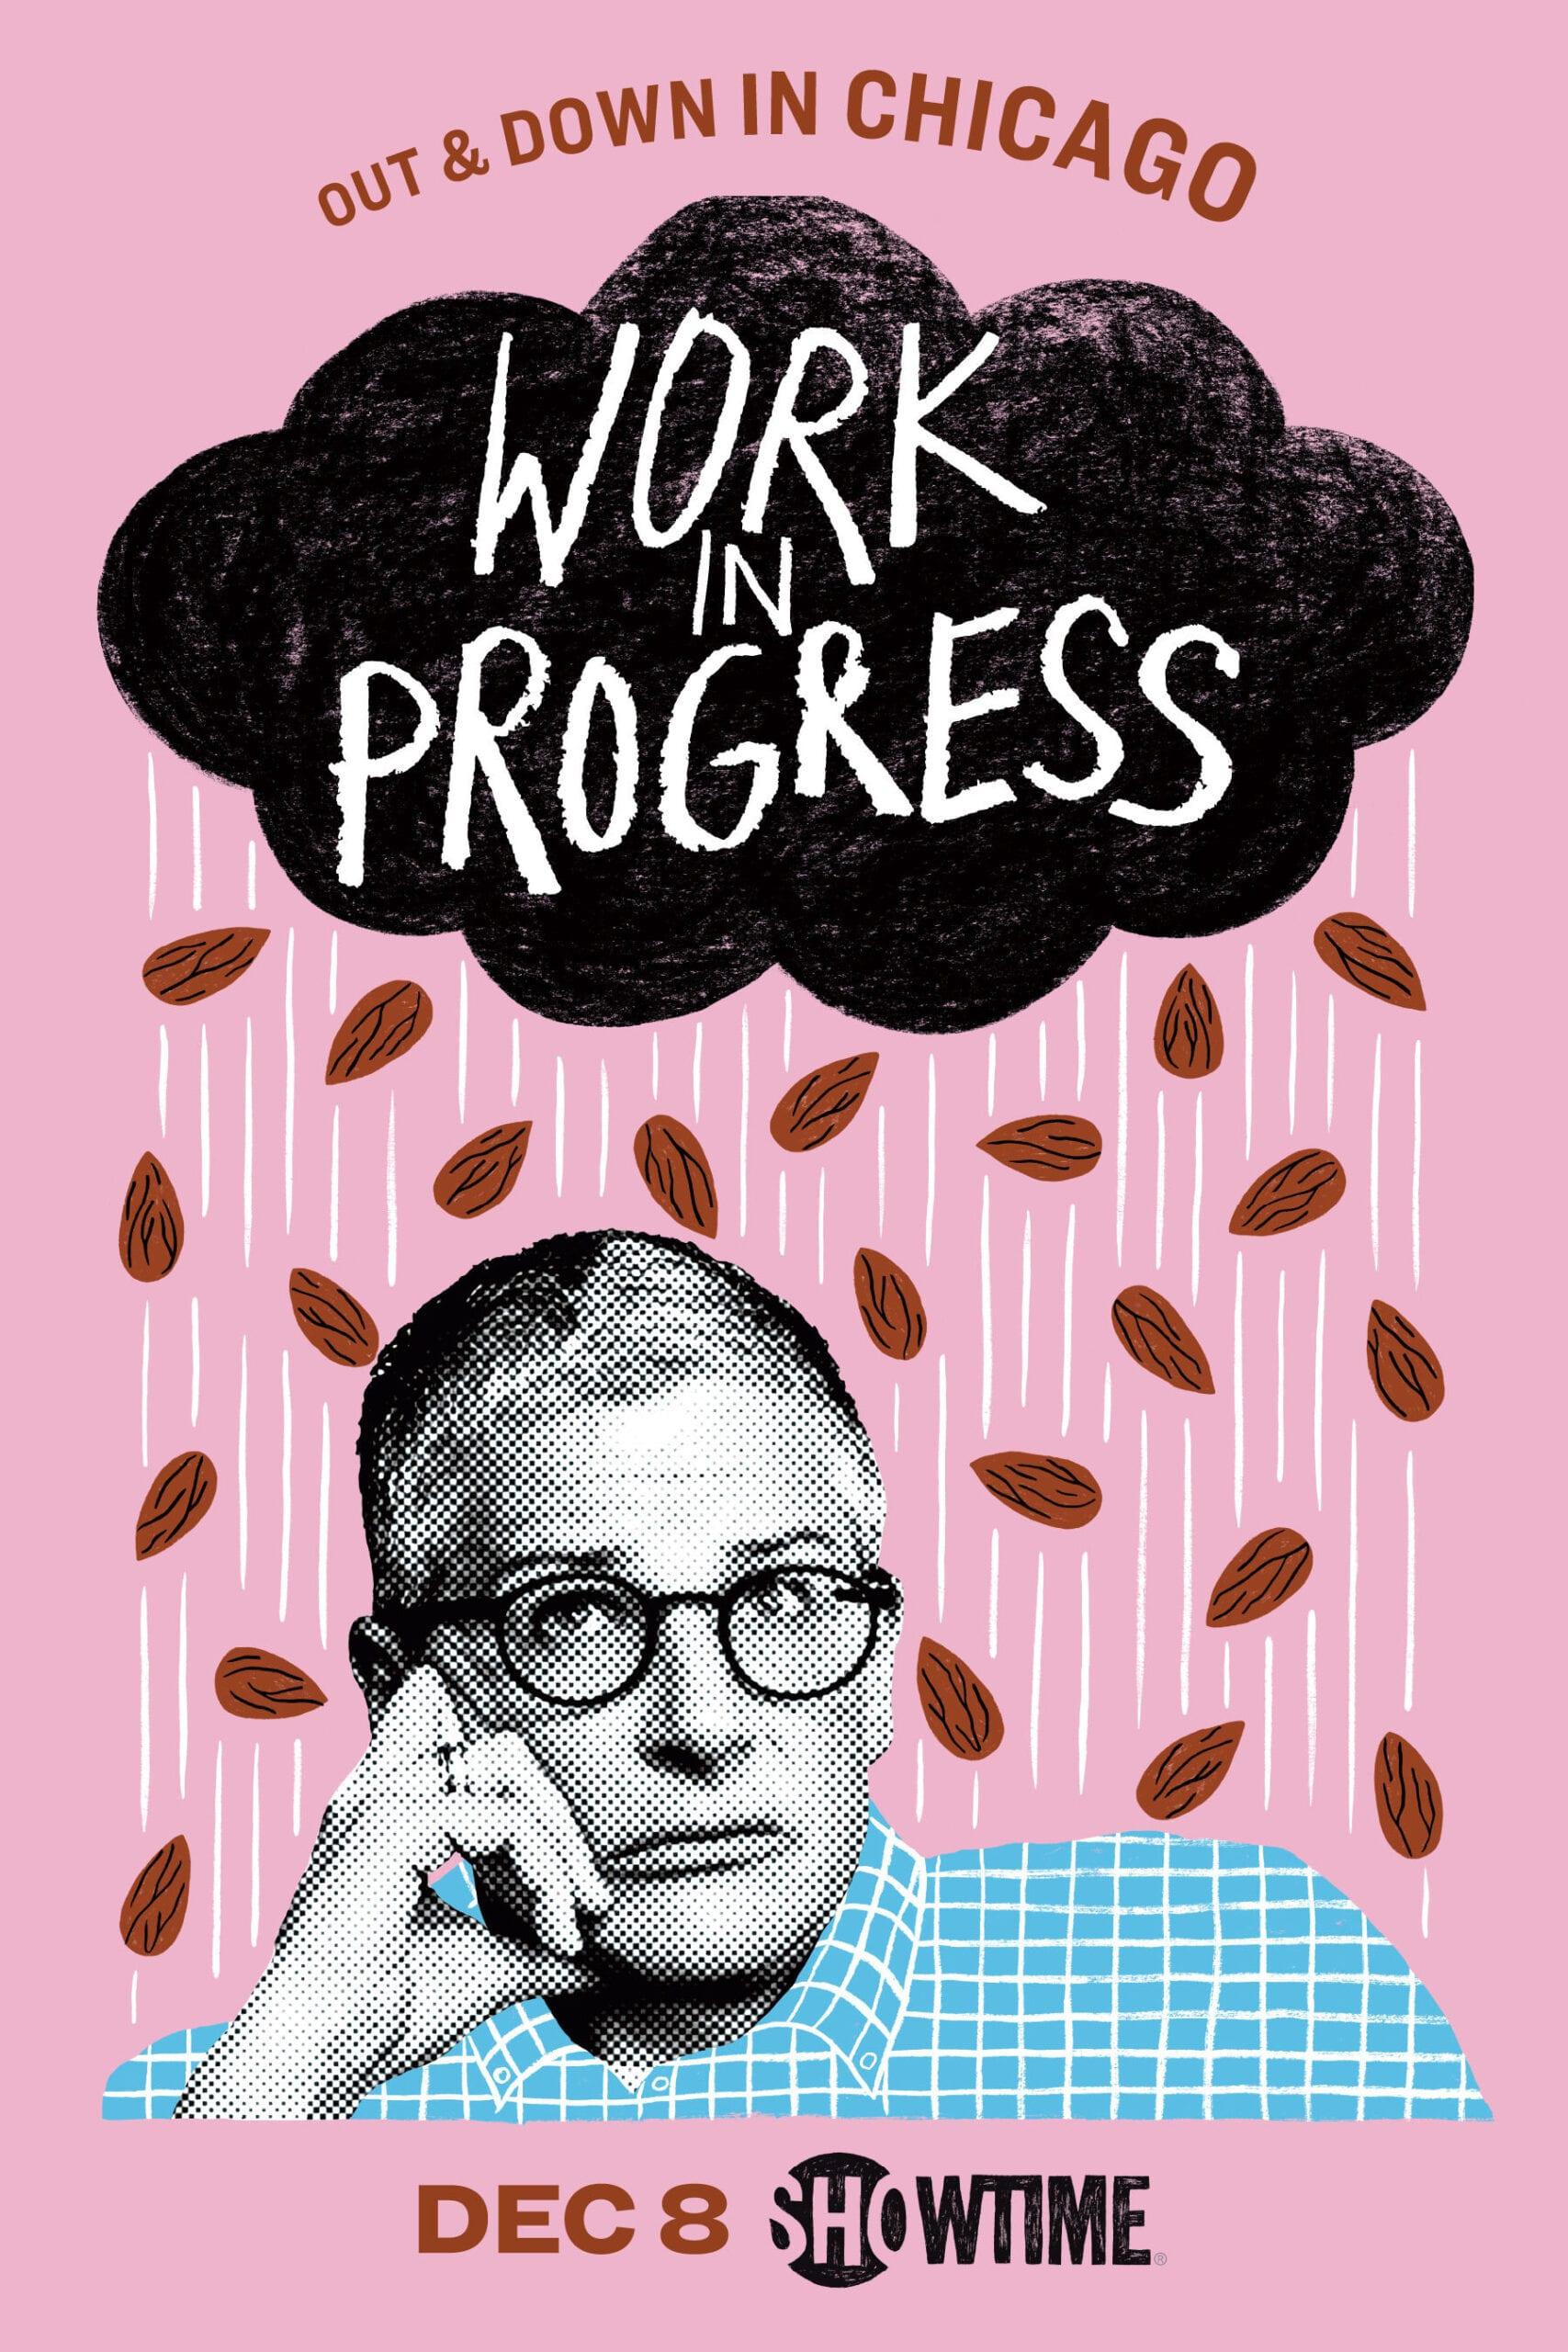 Work in Progress teaser image